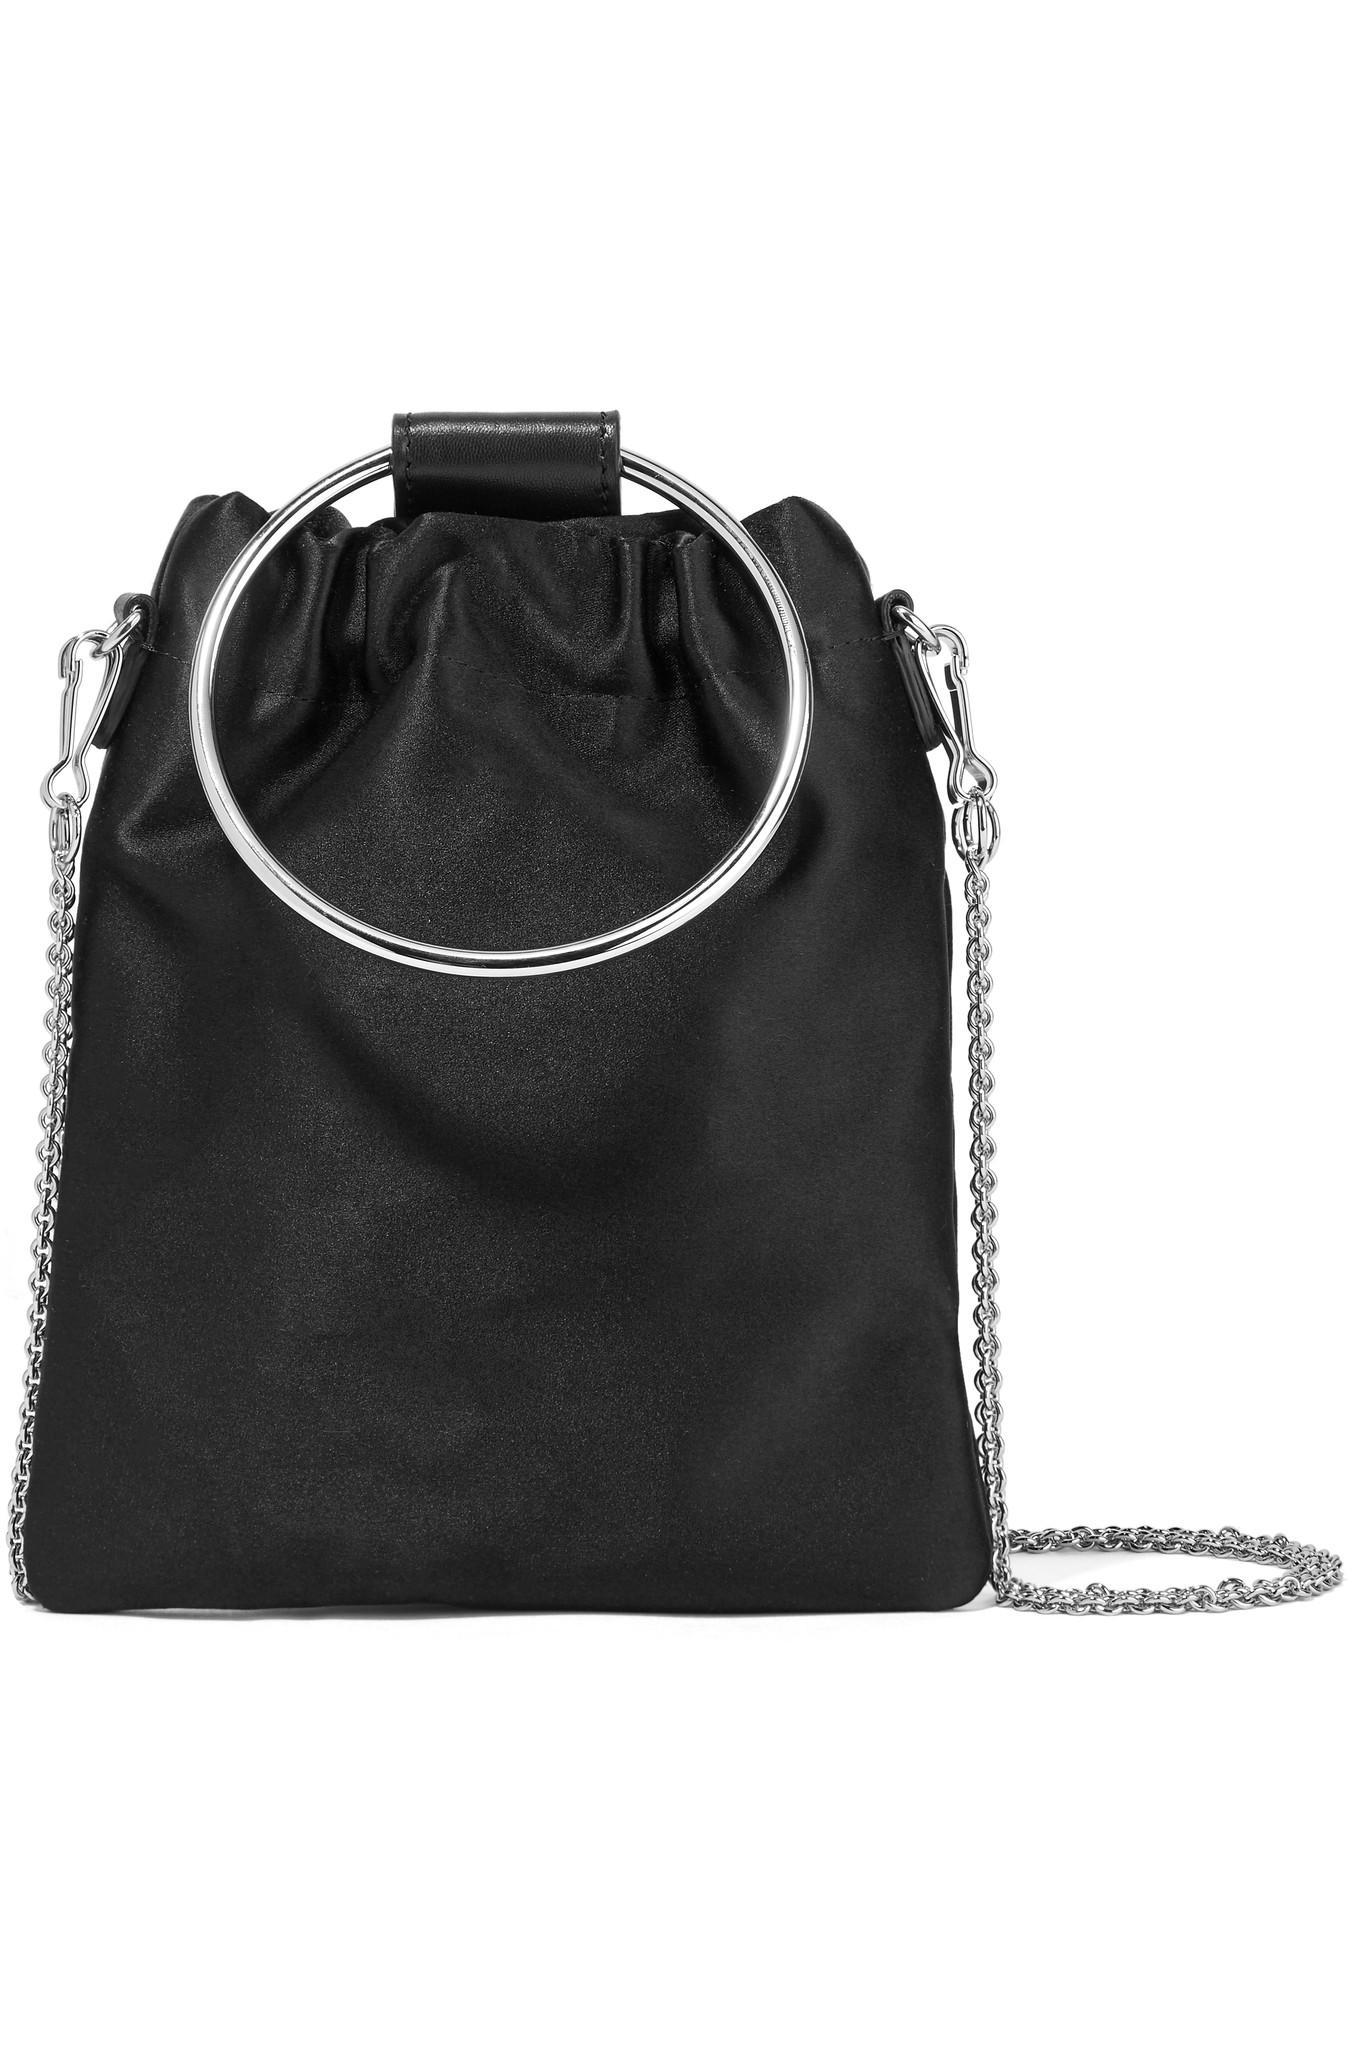 Post shoulder bag - Grey Theory FZEsi2